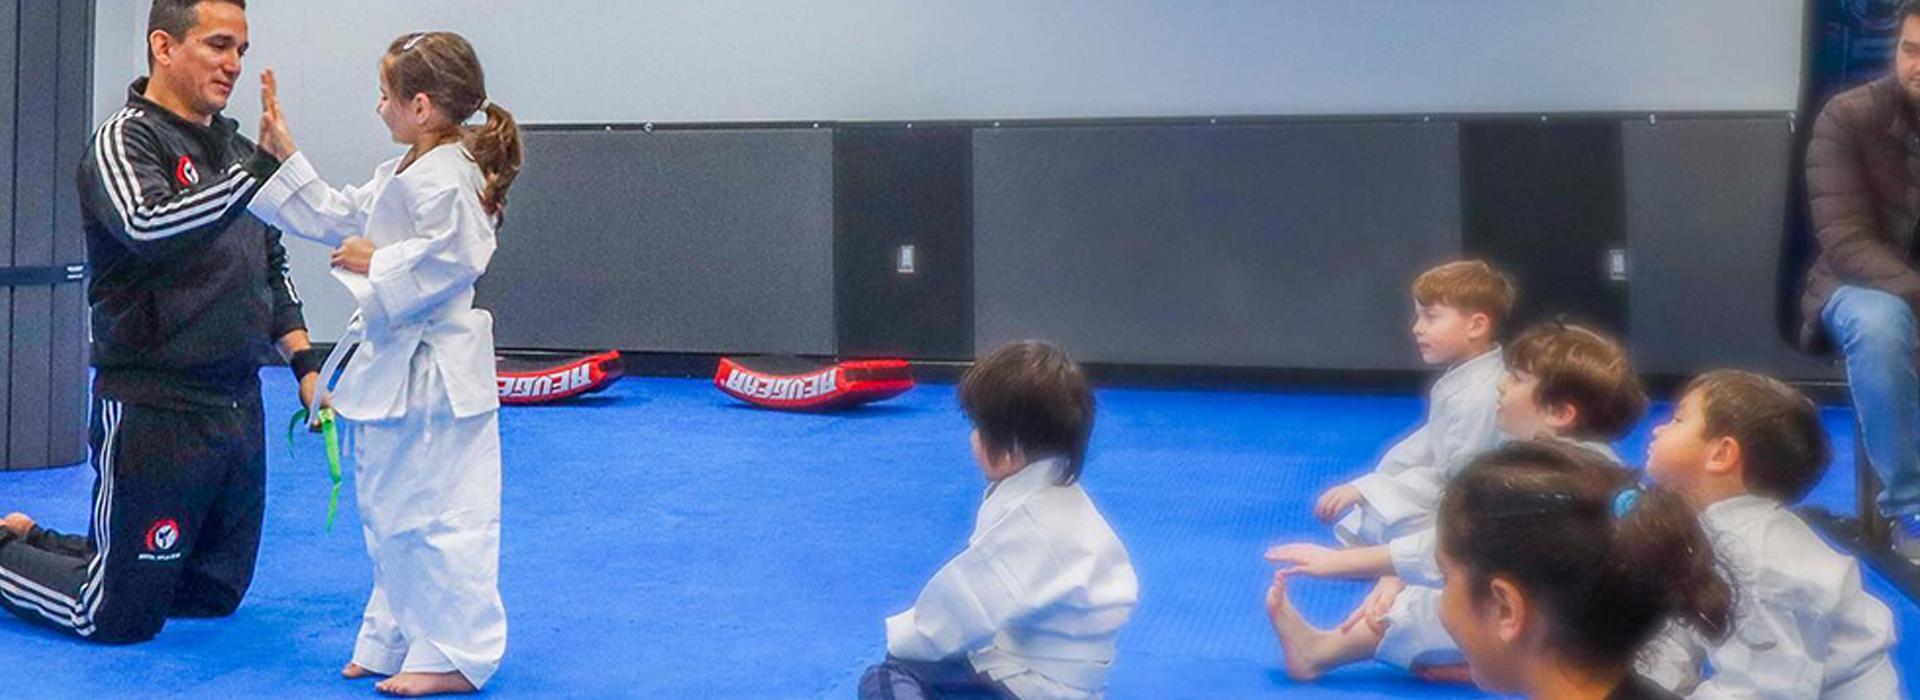 Kickboxing in Fairfax, VA close to Old Town Fairfax, Chantilly, Vienna, Fairfax, Great Falls, Providence Elementary School, Daniels Run Elementary School, Laurel Ridge Elementary School, Mosaic Elementary School, and the Mosaic District